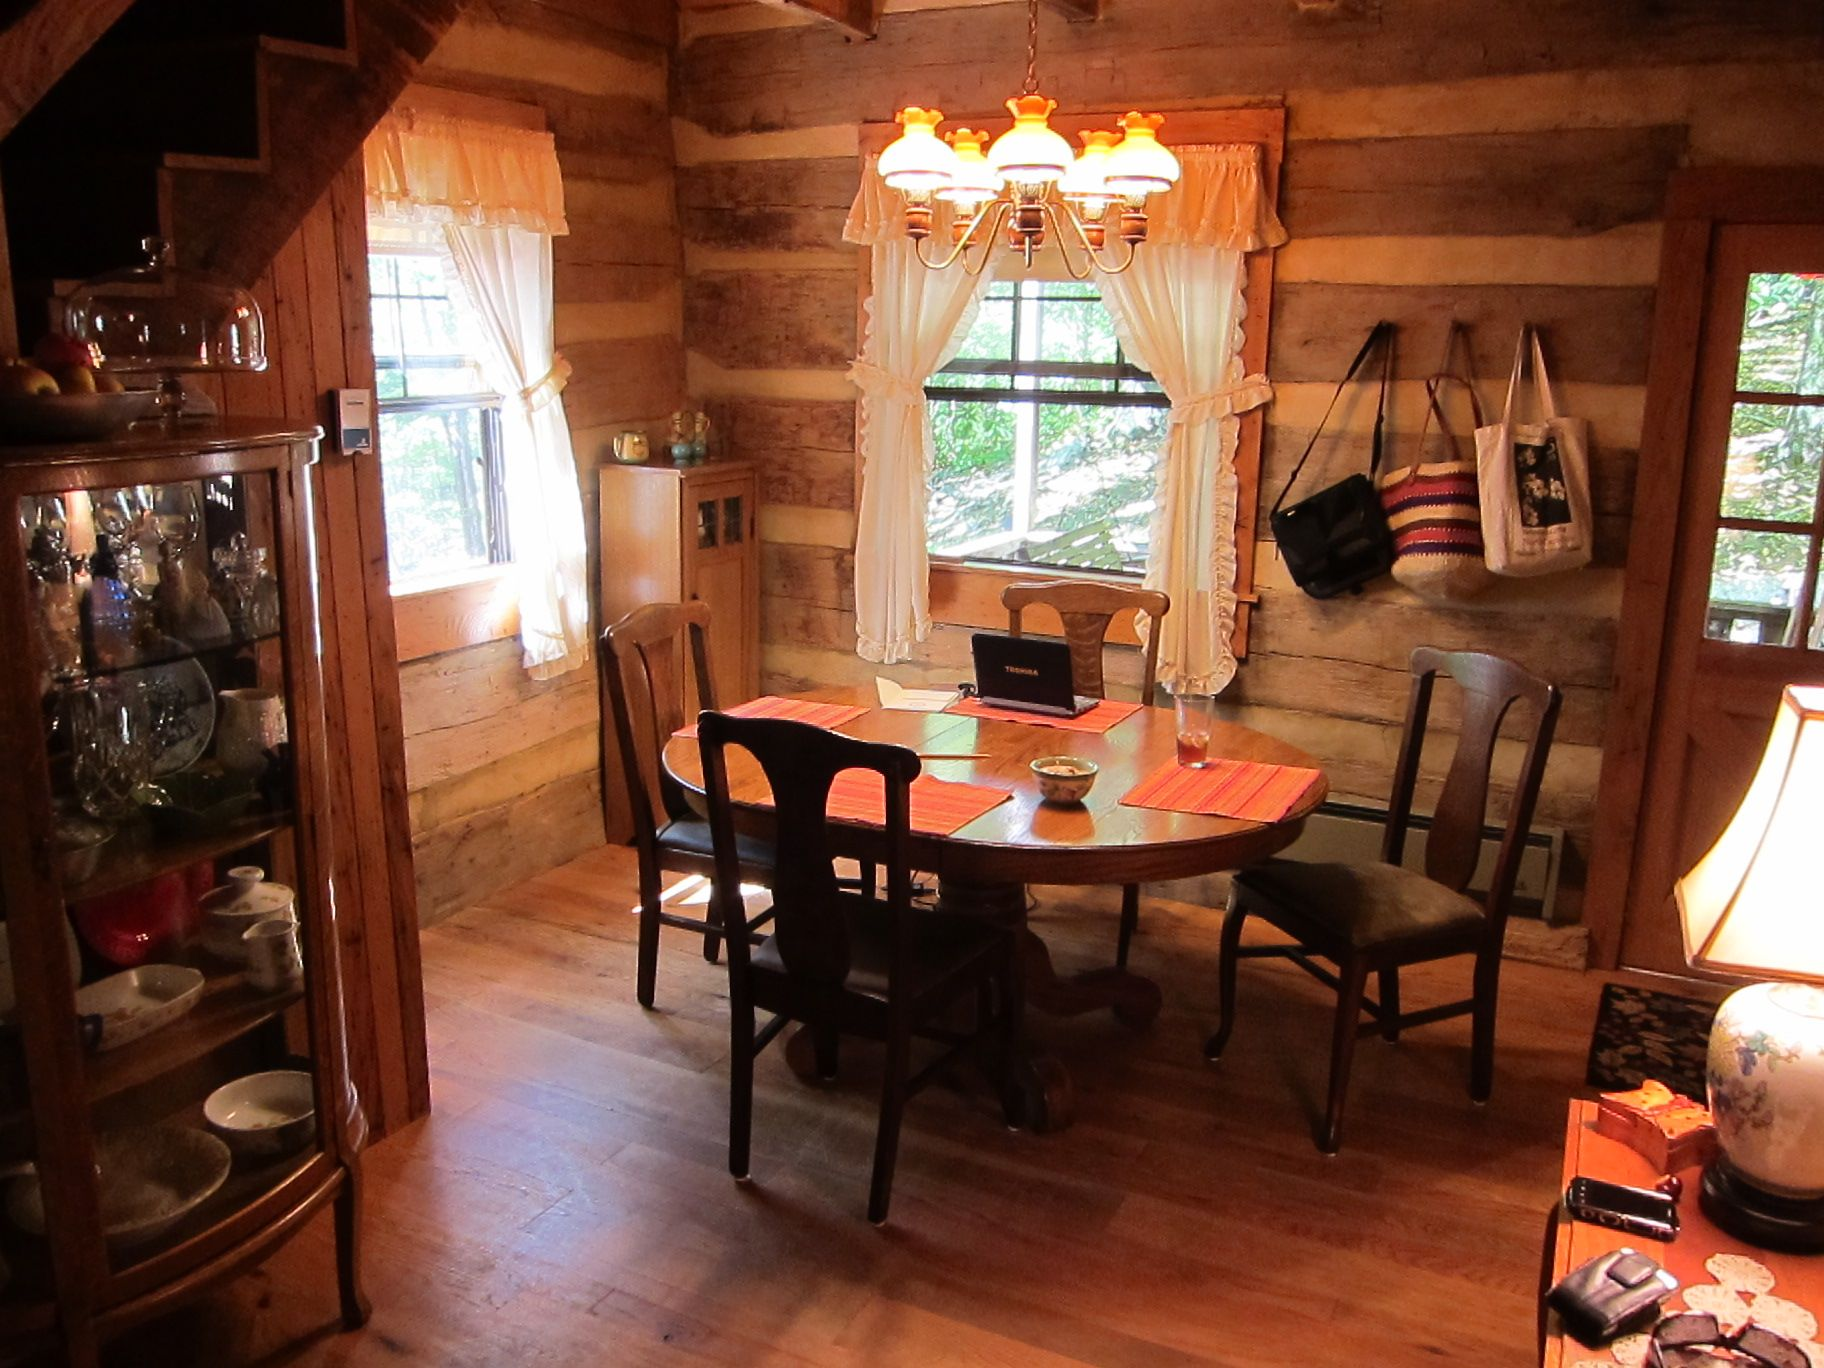 Rustic Cabin Interiors Lodge Log Cabin Style Decorating